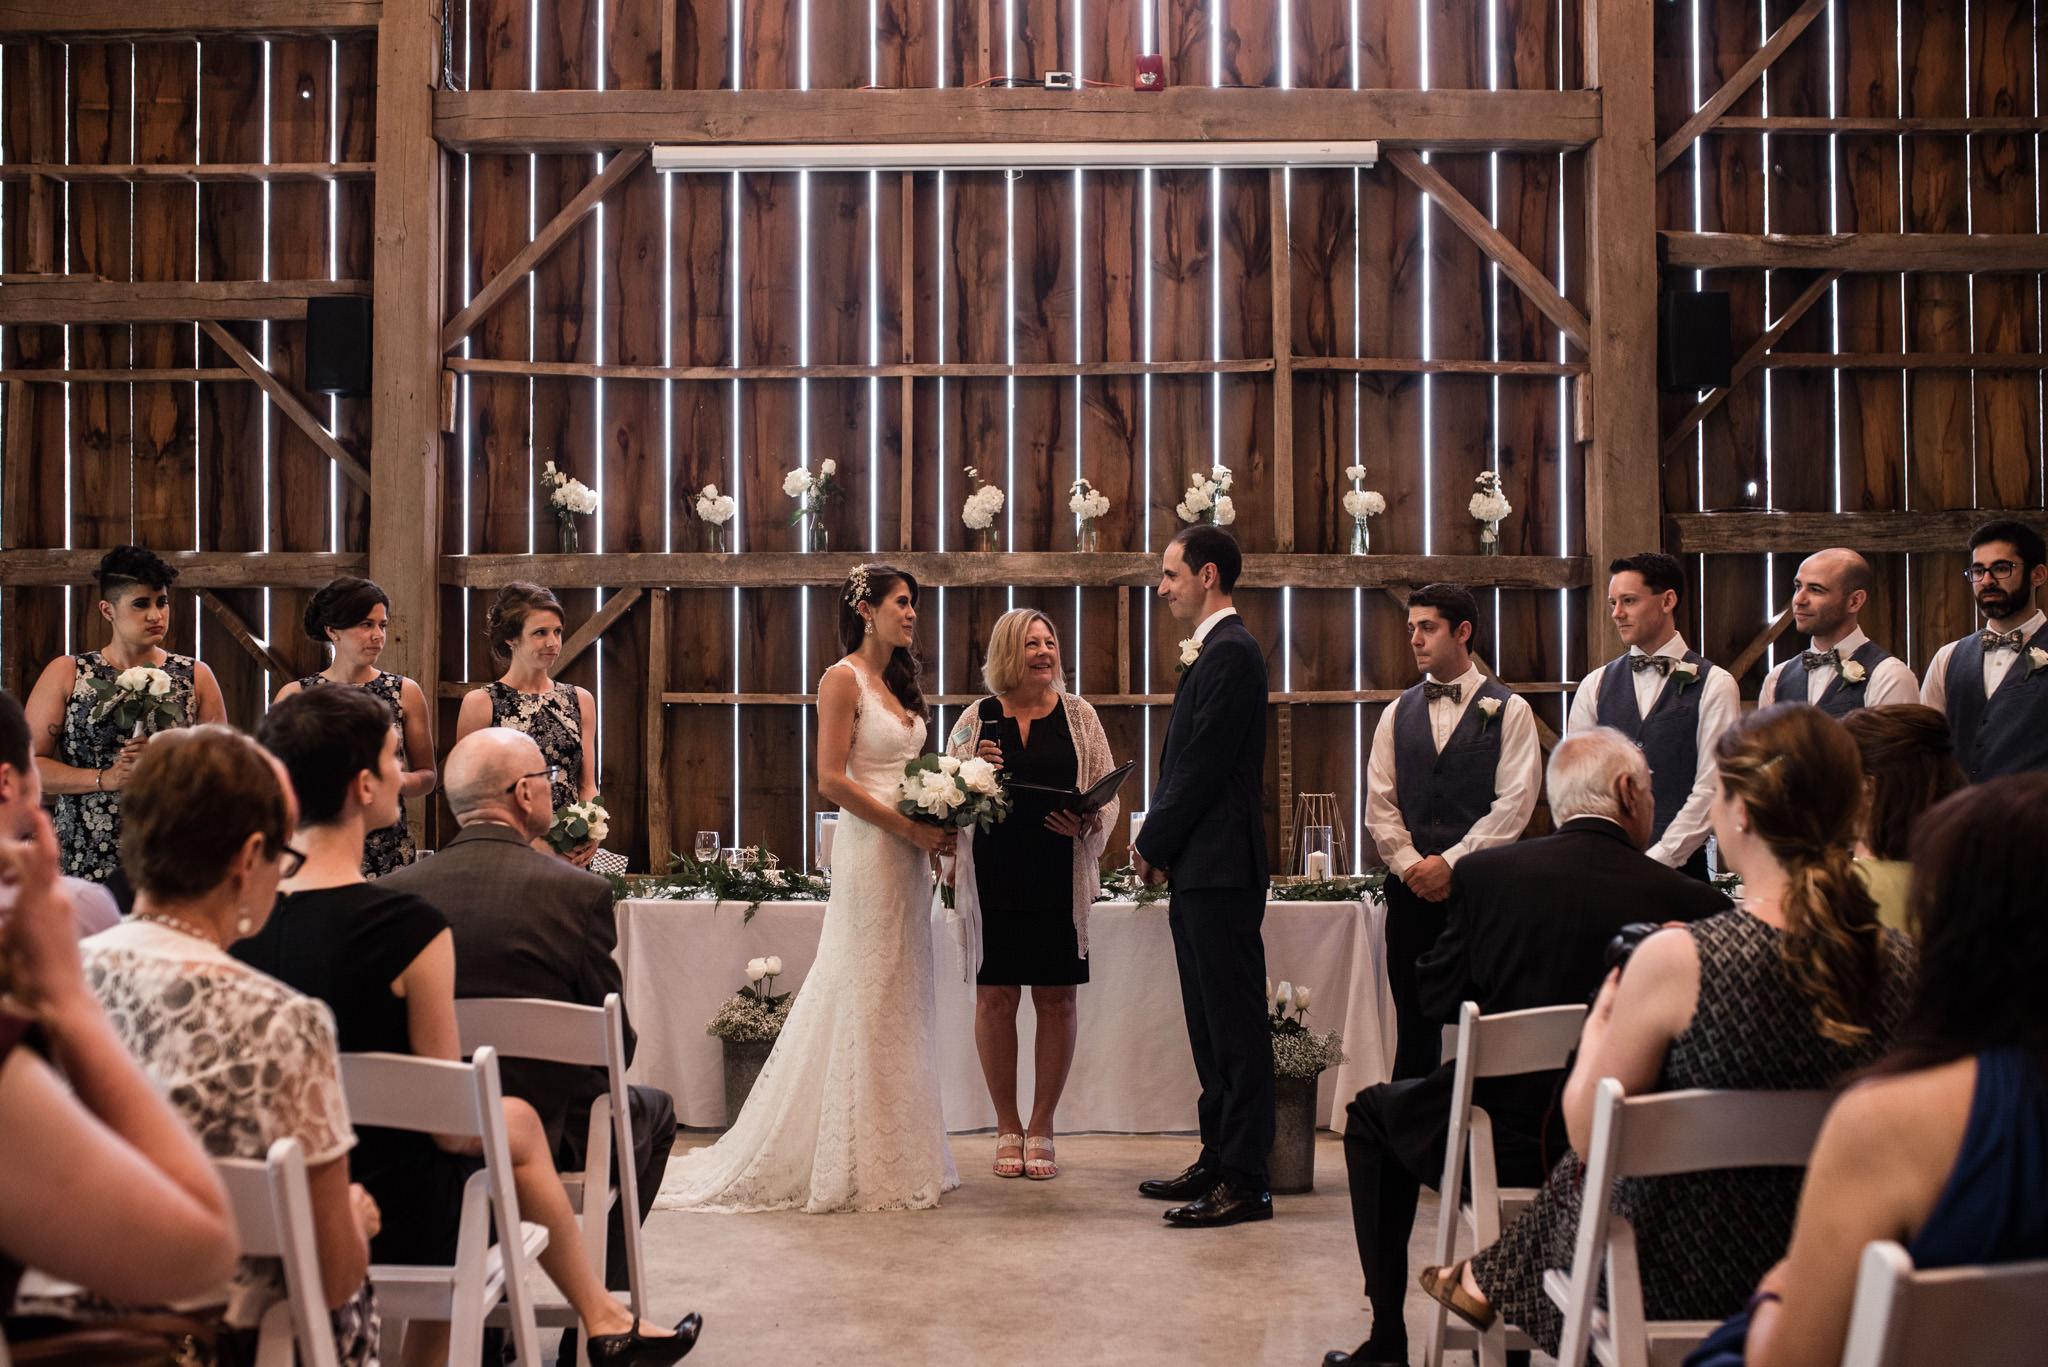 129-wedding-ceremony-in-the-rain-toronto-photographer.jpg